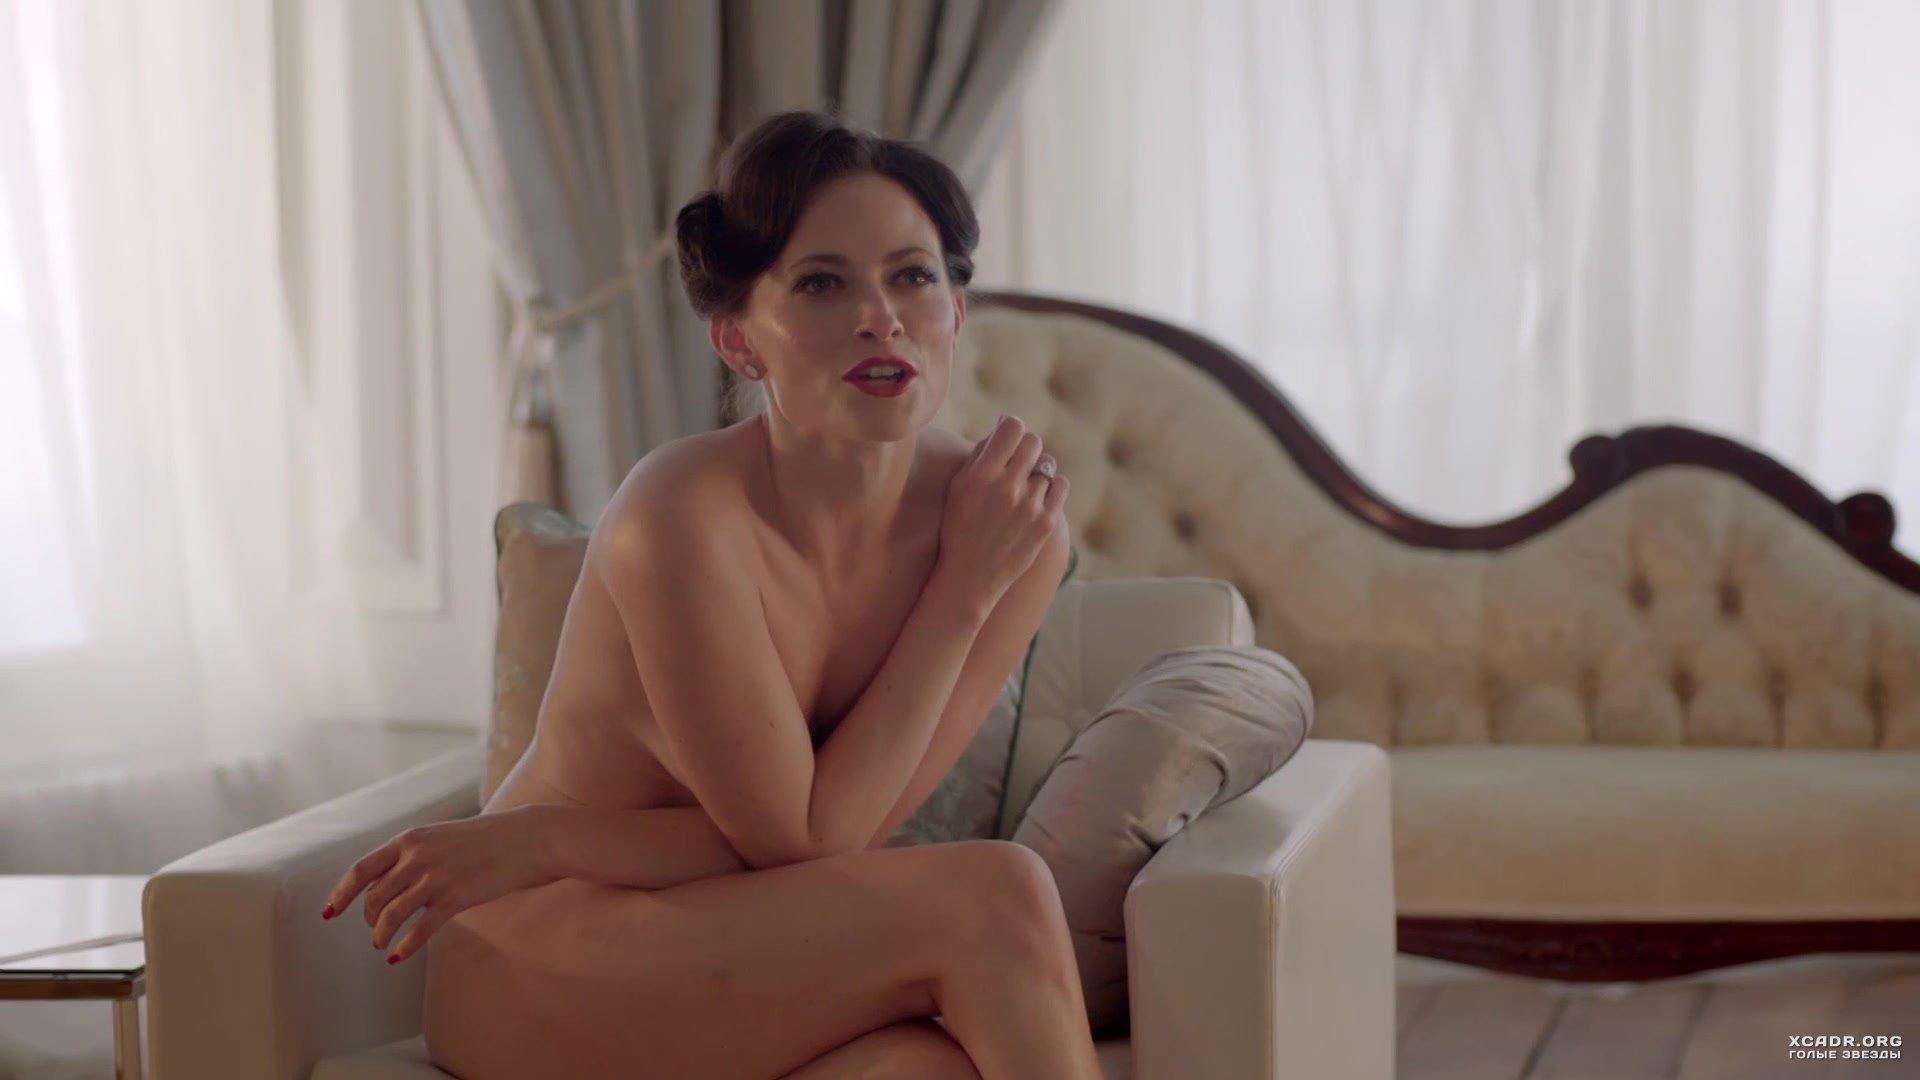 Ирен адлер секс порно онлайн